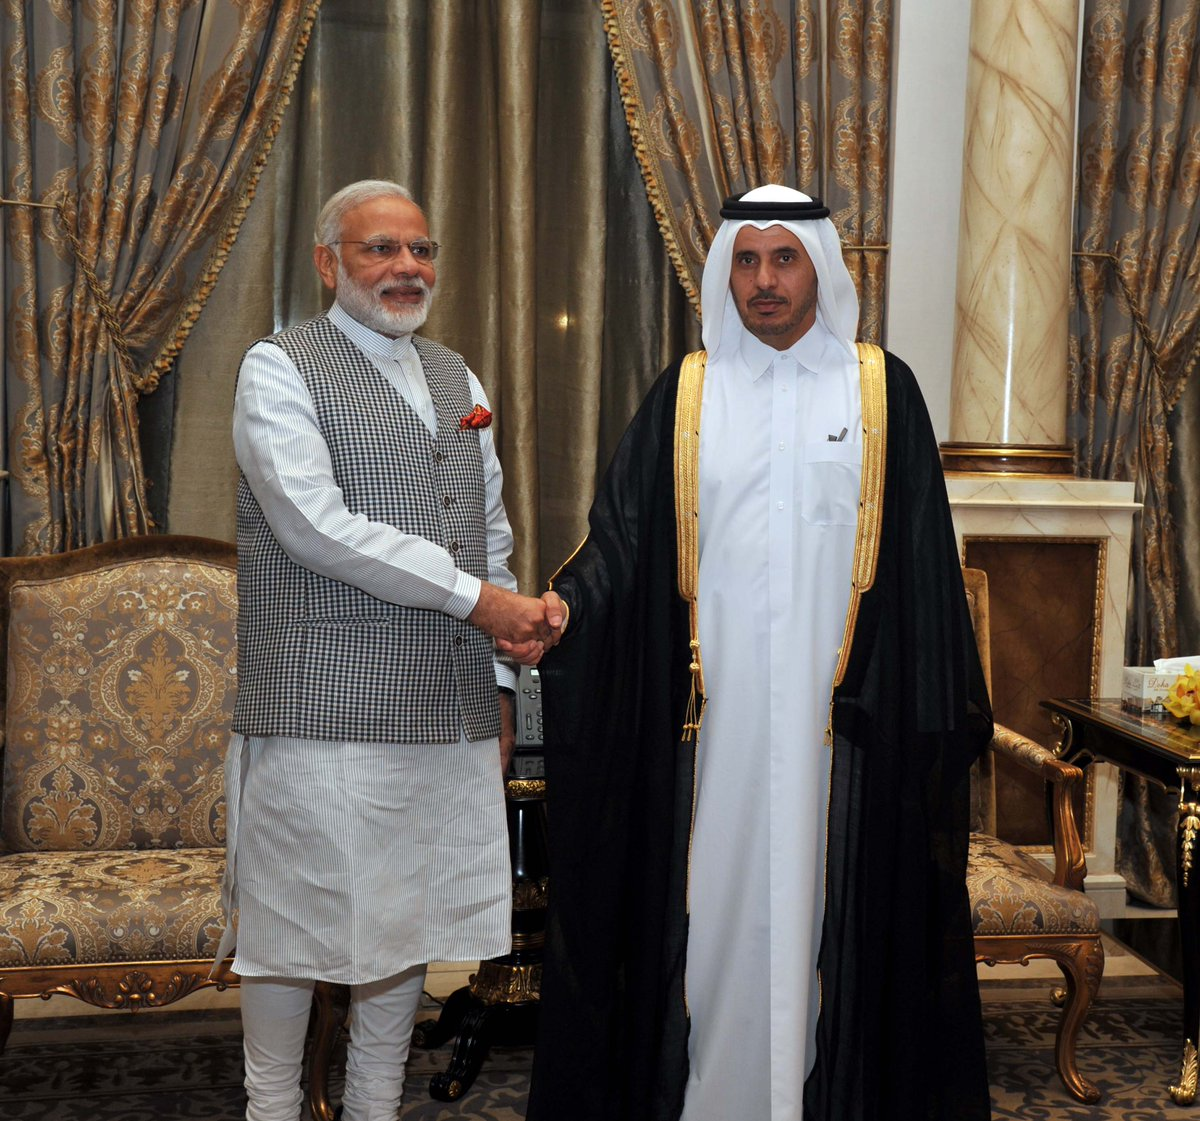 Met PM Sheikh Abdullah Bin Nasser Al Thani earlier this evening in Doha.